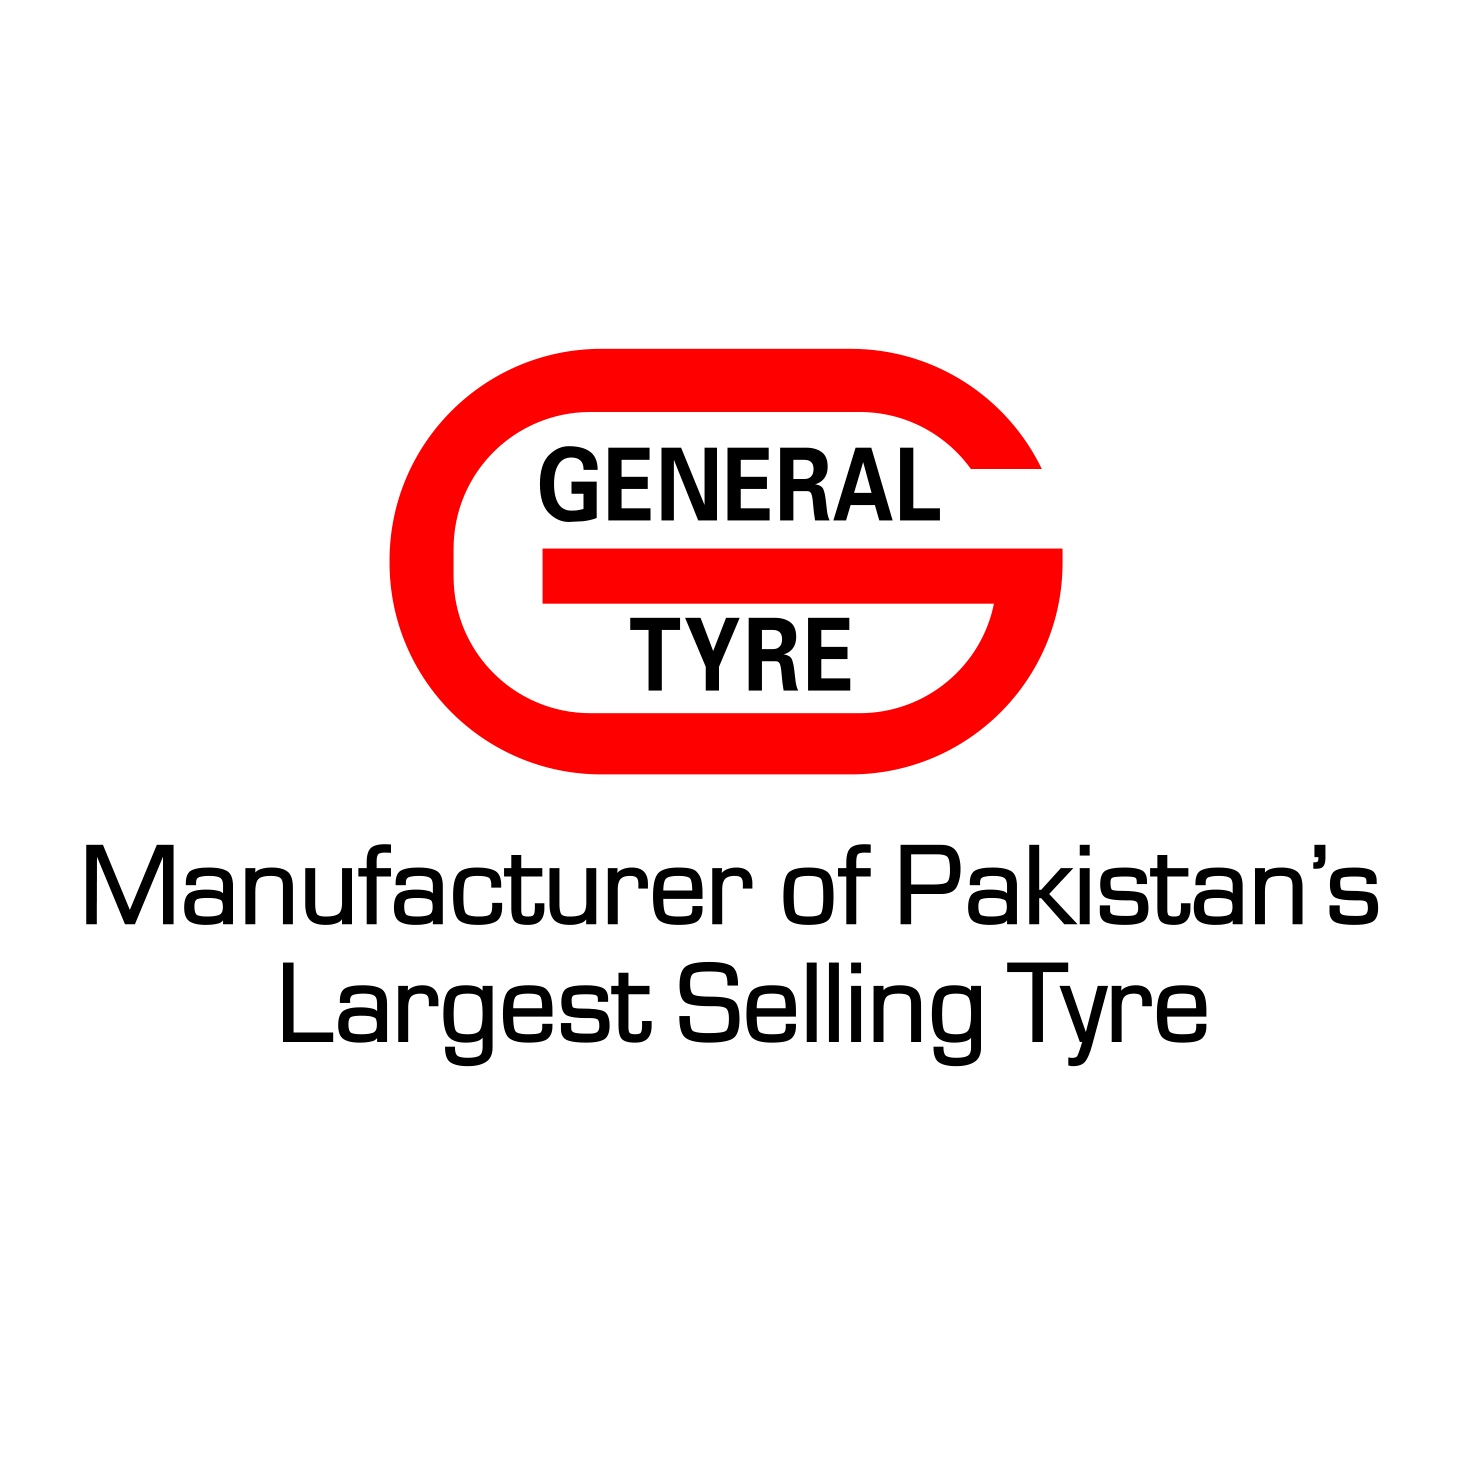 general-tyre